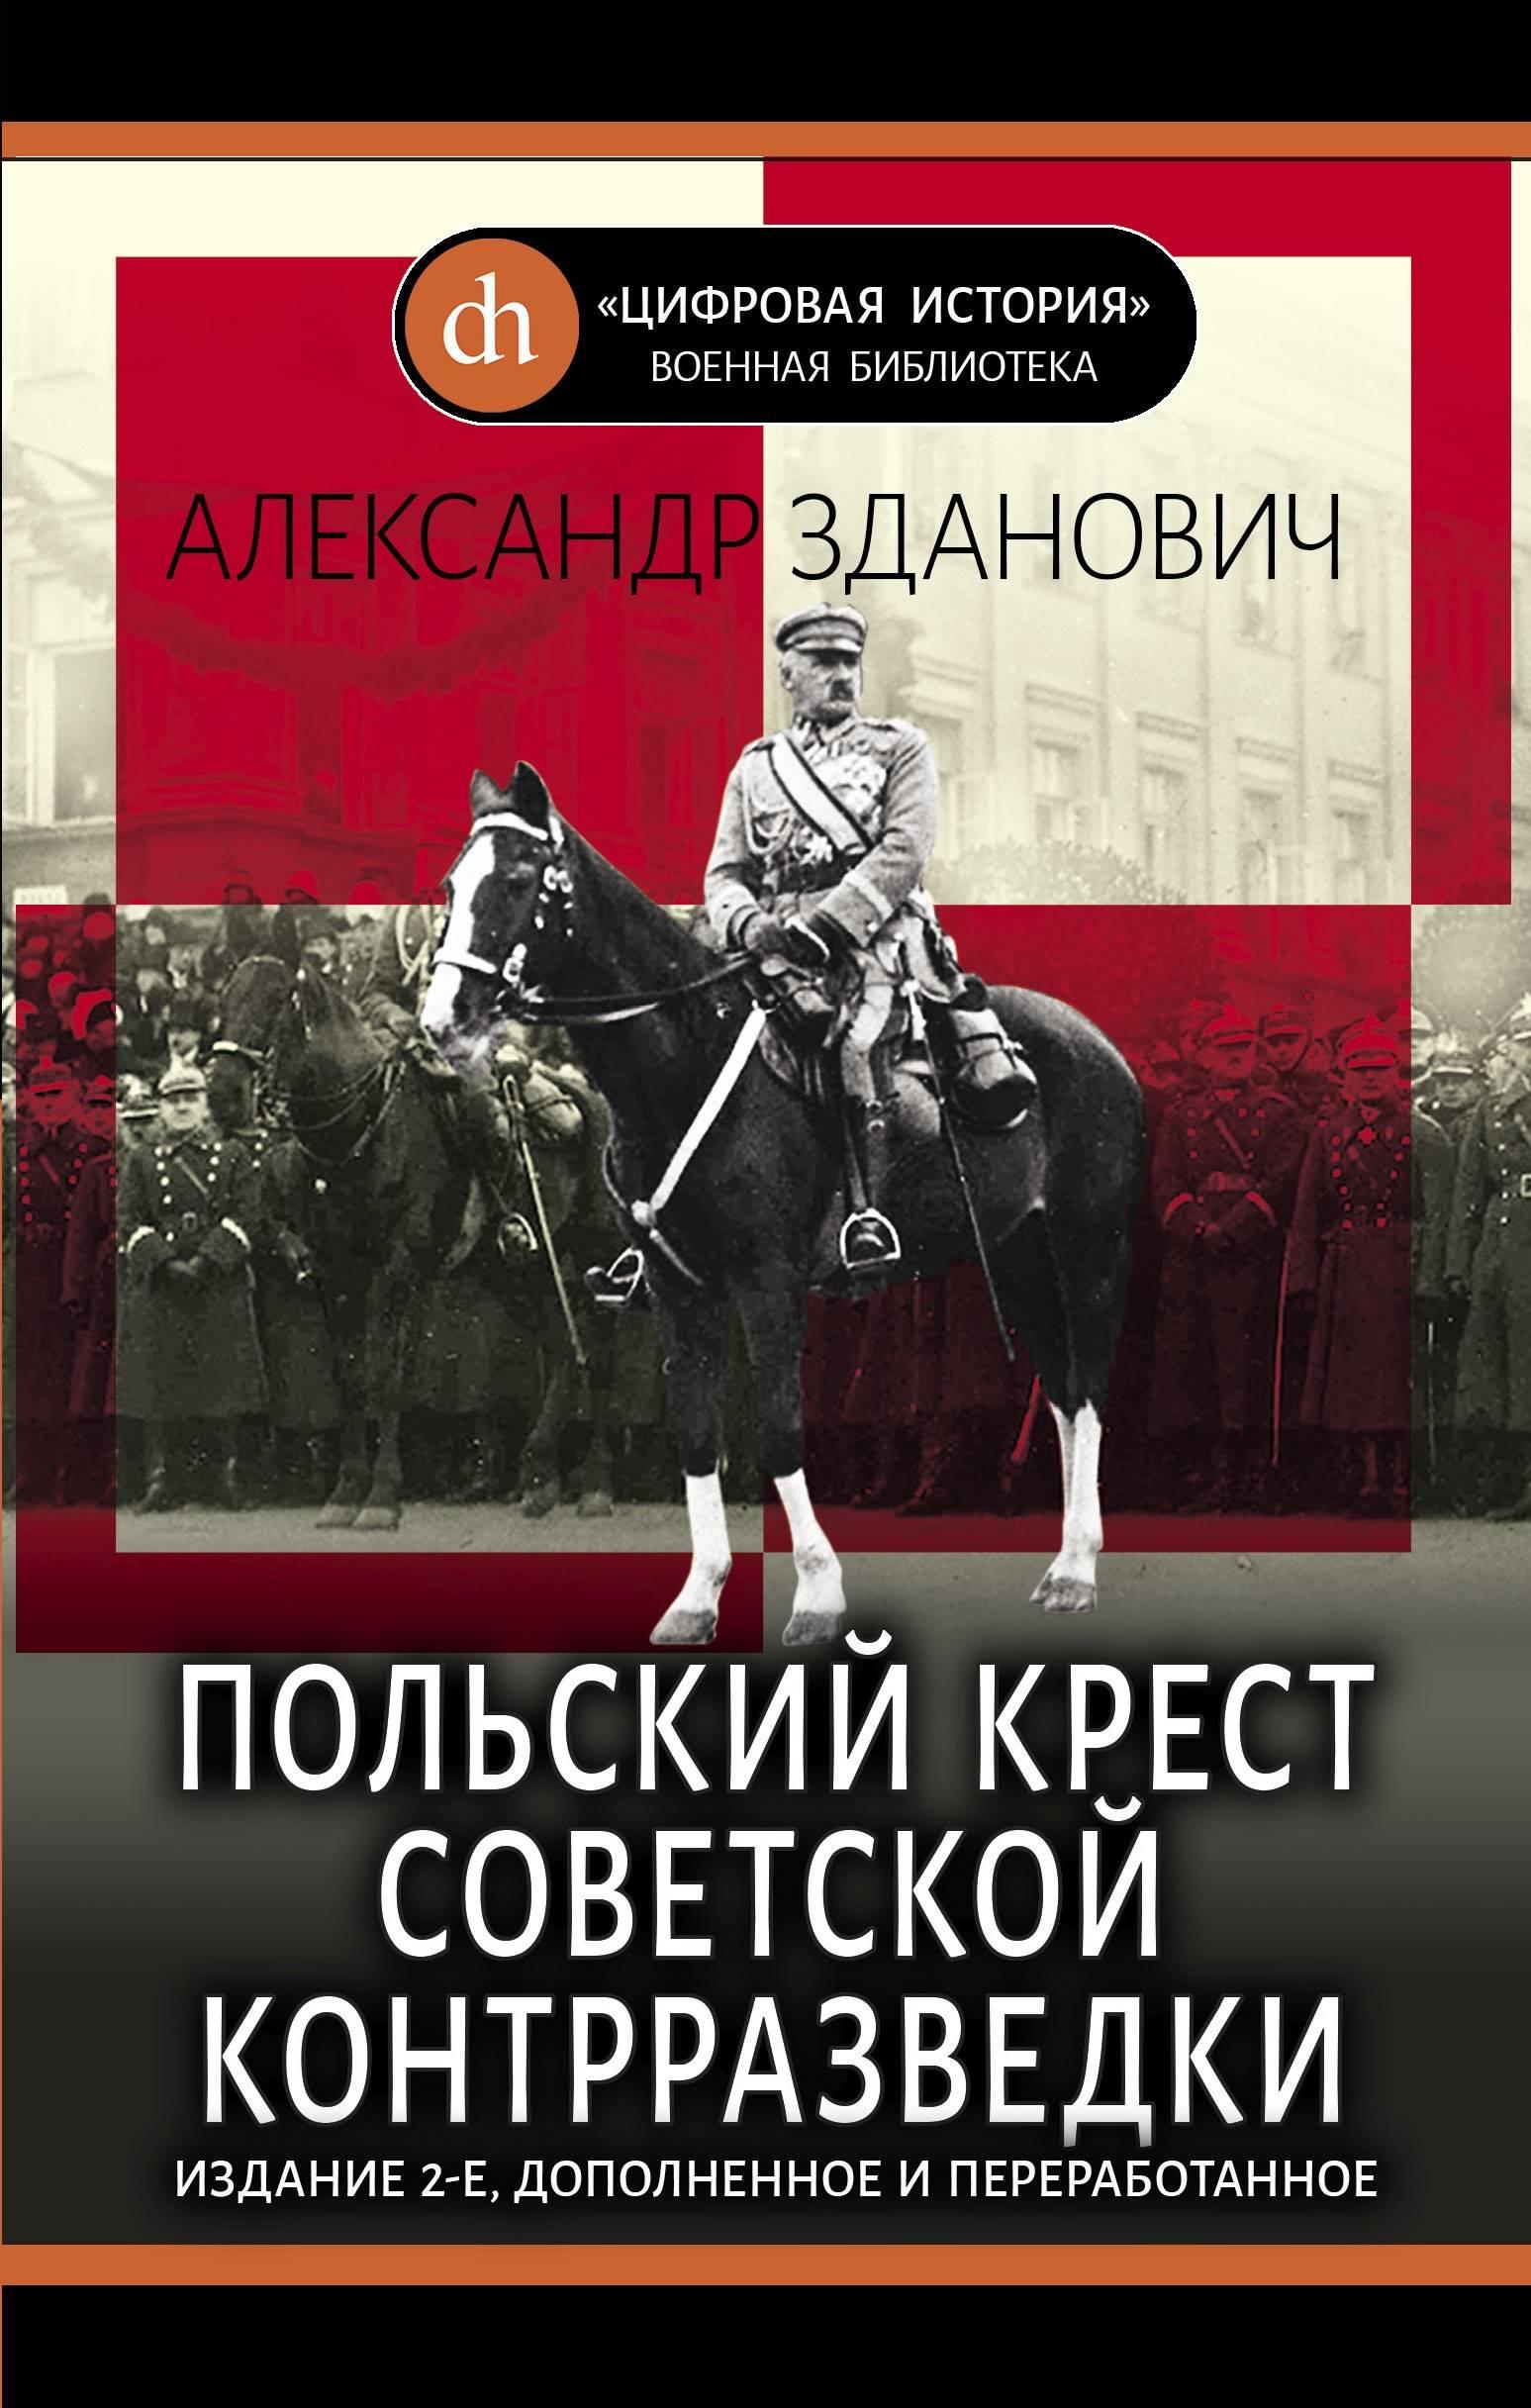 Polskij krest sovetskoj kontrrazvedki